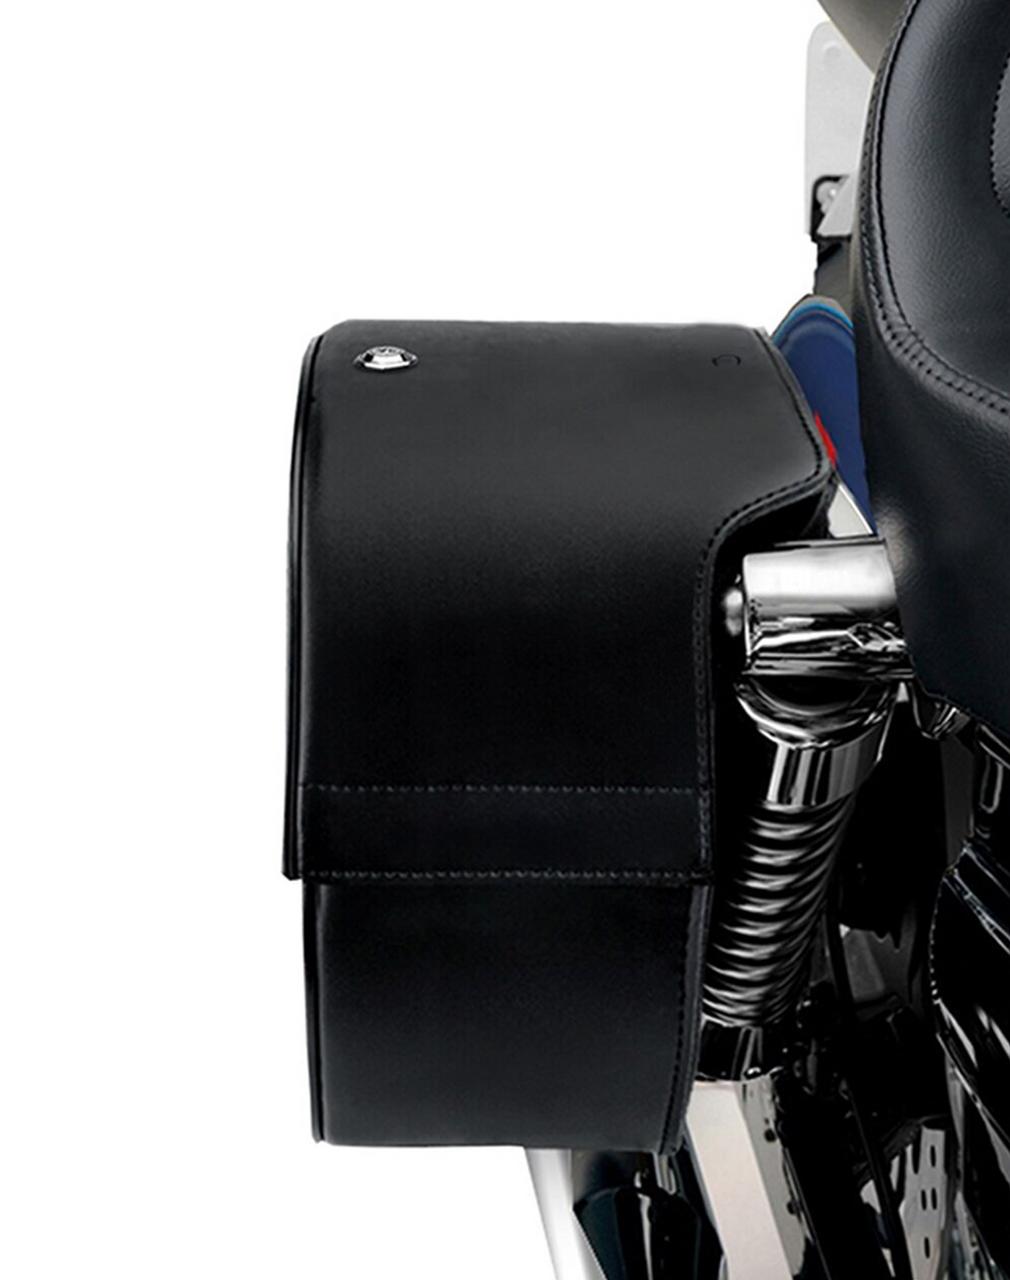 Triumph Rocket III Roadster Vikingbags Shock Cutout Single Strap Large Slanted Studded Leather Motorcycle Saddlebags Shock Cutout View